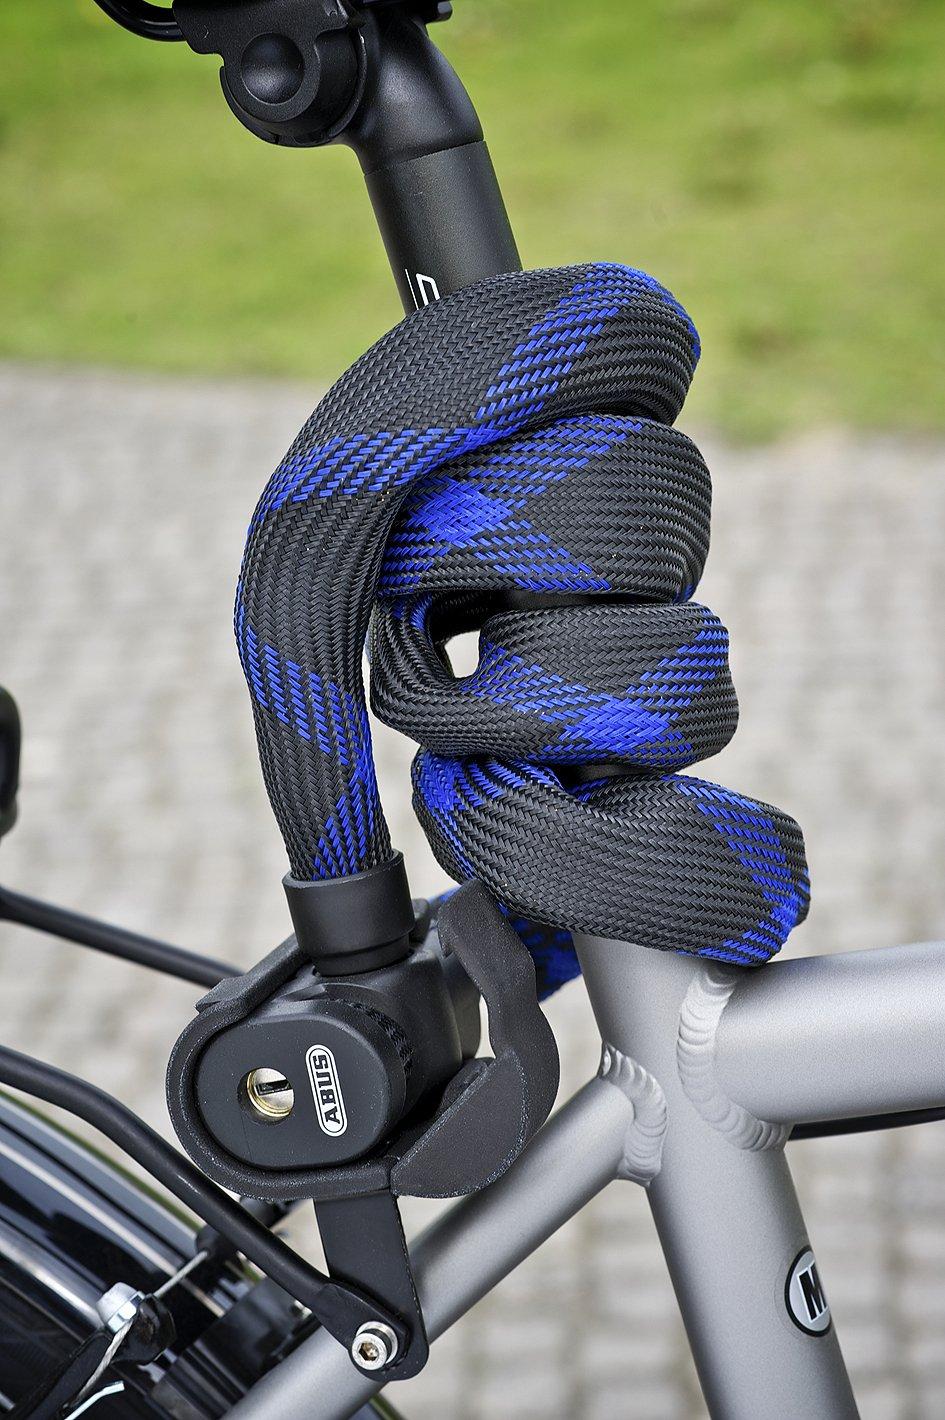 ABUS Ivera Steel-O-Flex 7200/110 cabel lock RBU black by ABUS (Image #7)